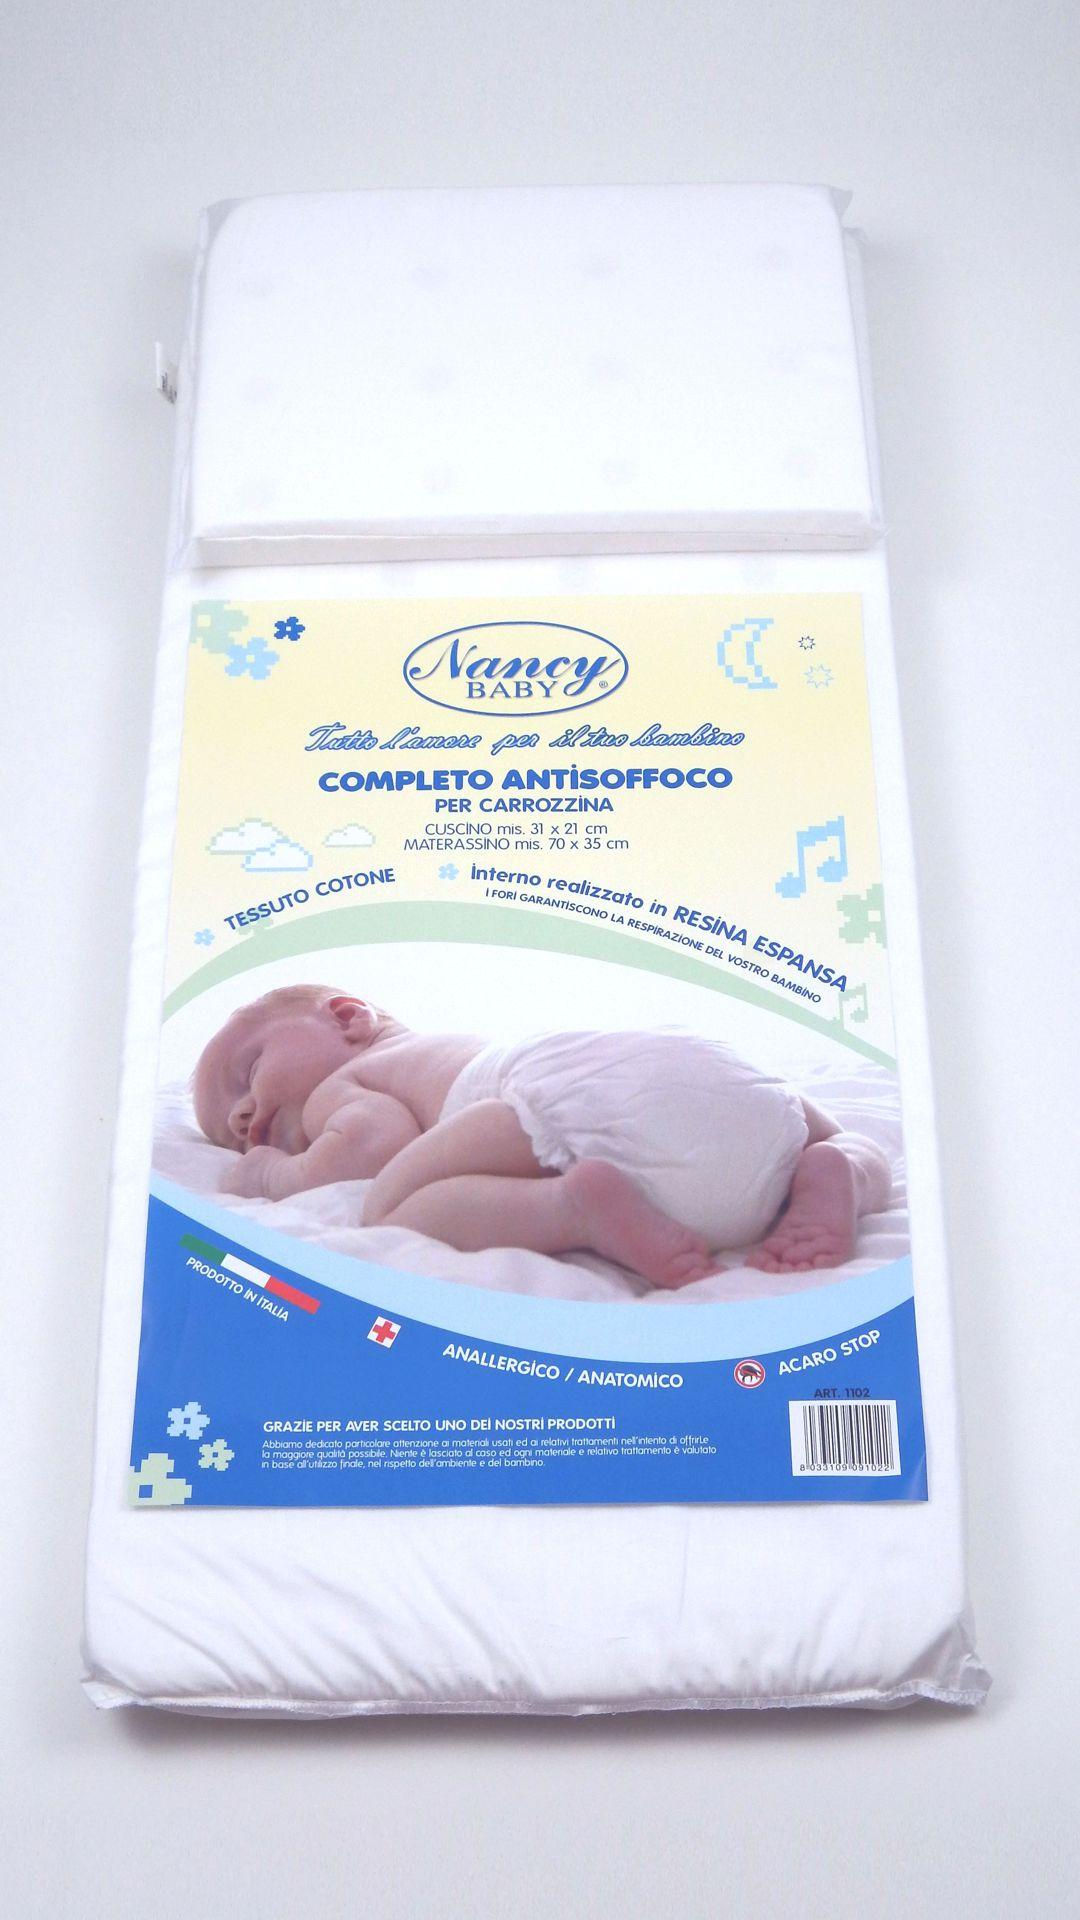 Materassino cuscino culla carrozzina nancy baby for Misure cuscino carrozzina